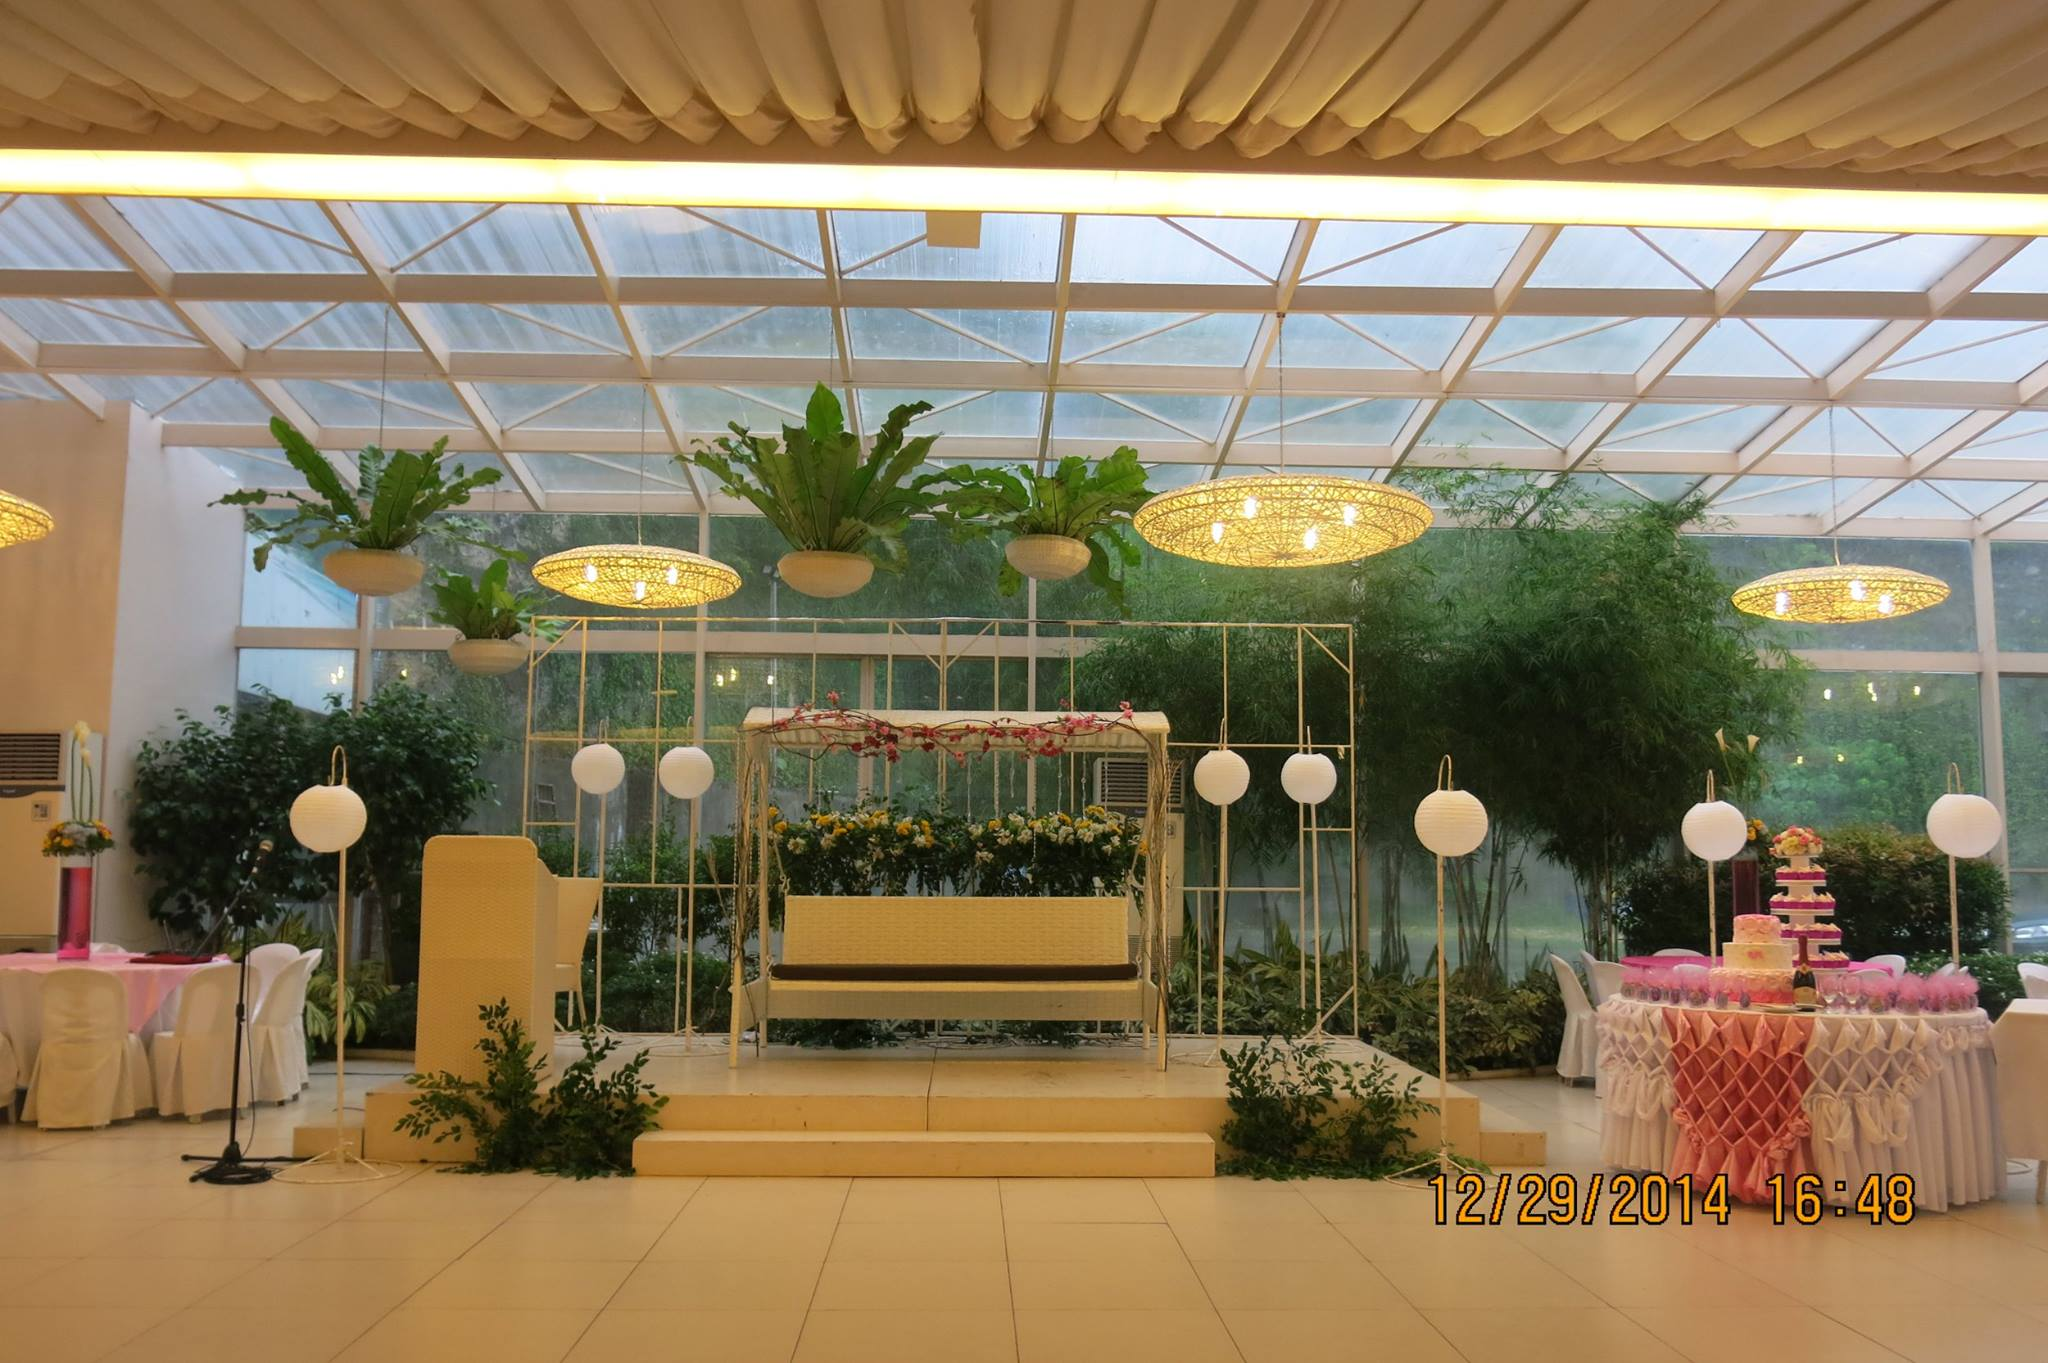 Paradise Garden Events Pavilion | Wedding Venue in Cebu ...